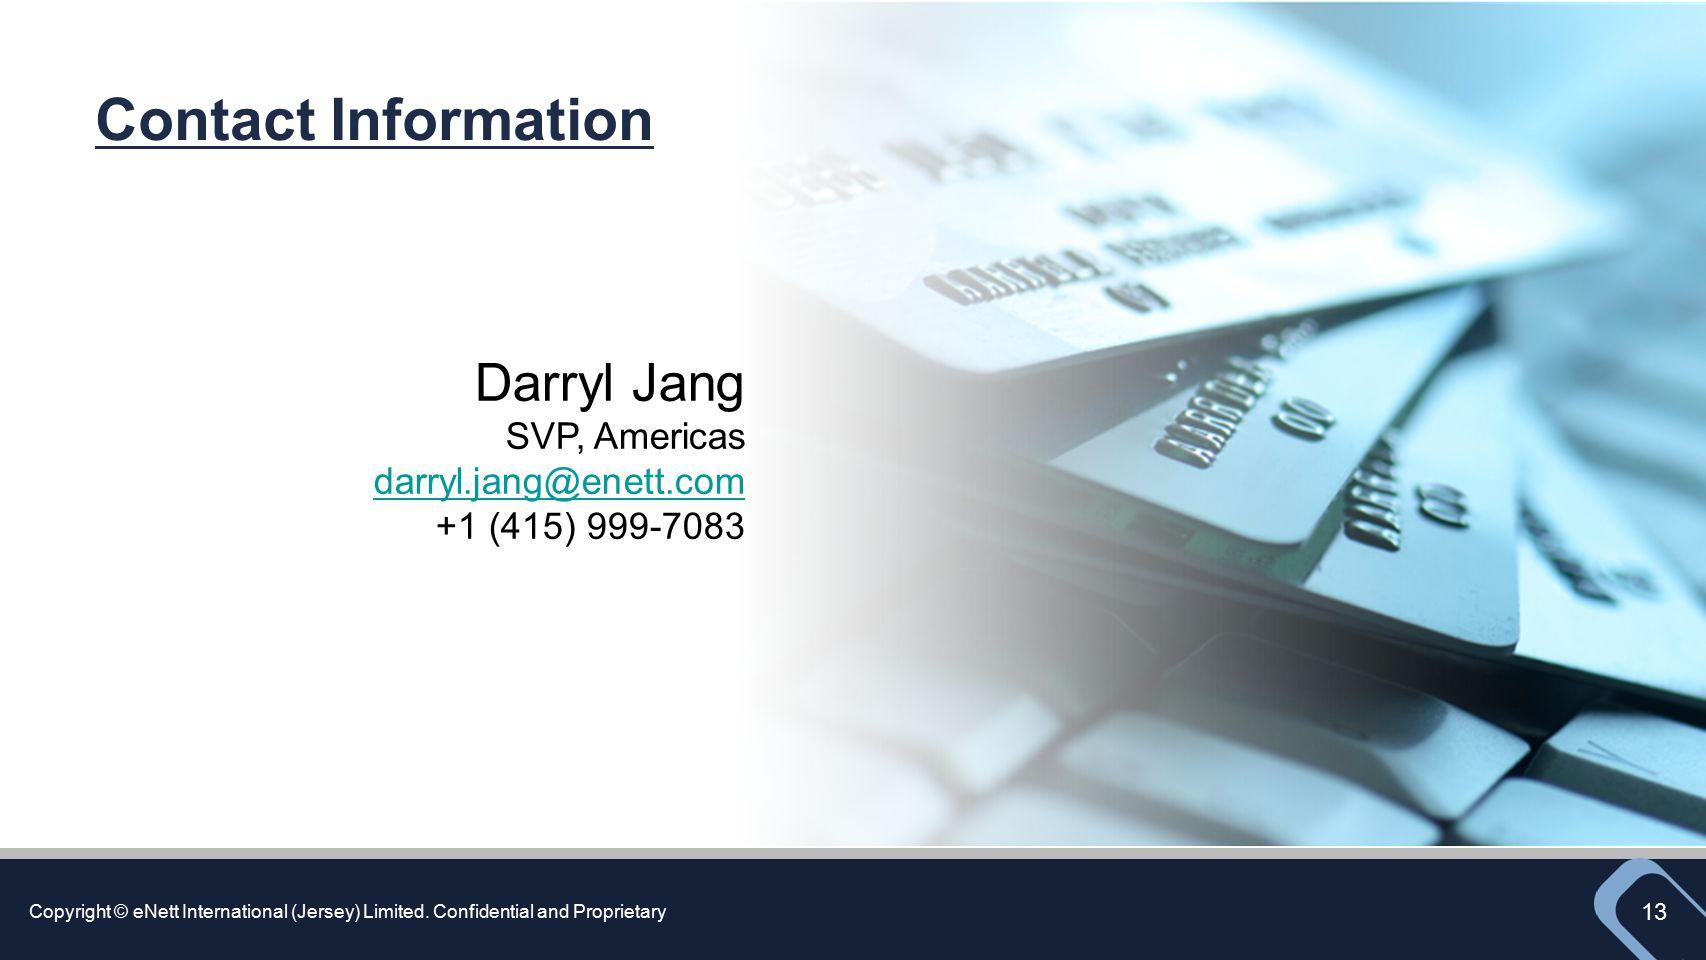 Copyright © eNett International (Jersey) Limited. Confidential and Proprietary 13 Contact Information Darryl Jang SVP, Americas darryl.jang@enett.com